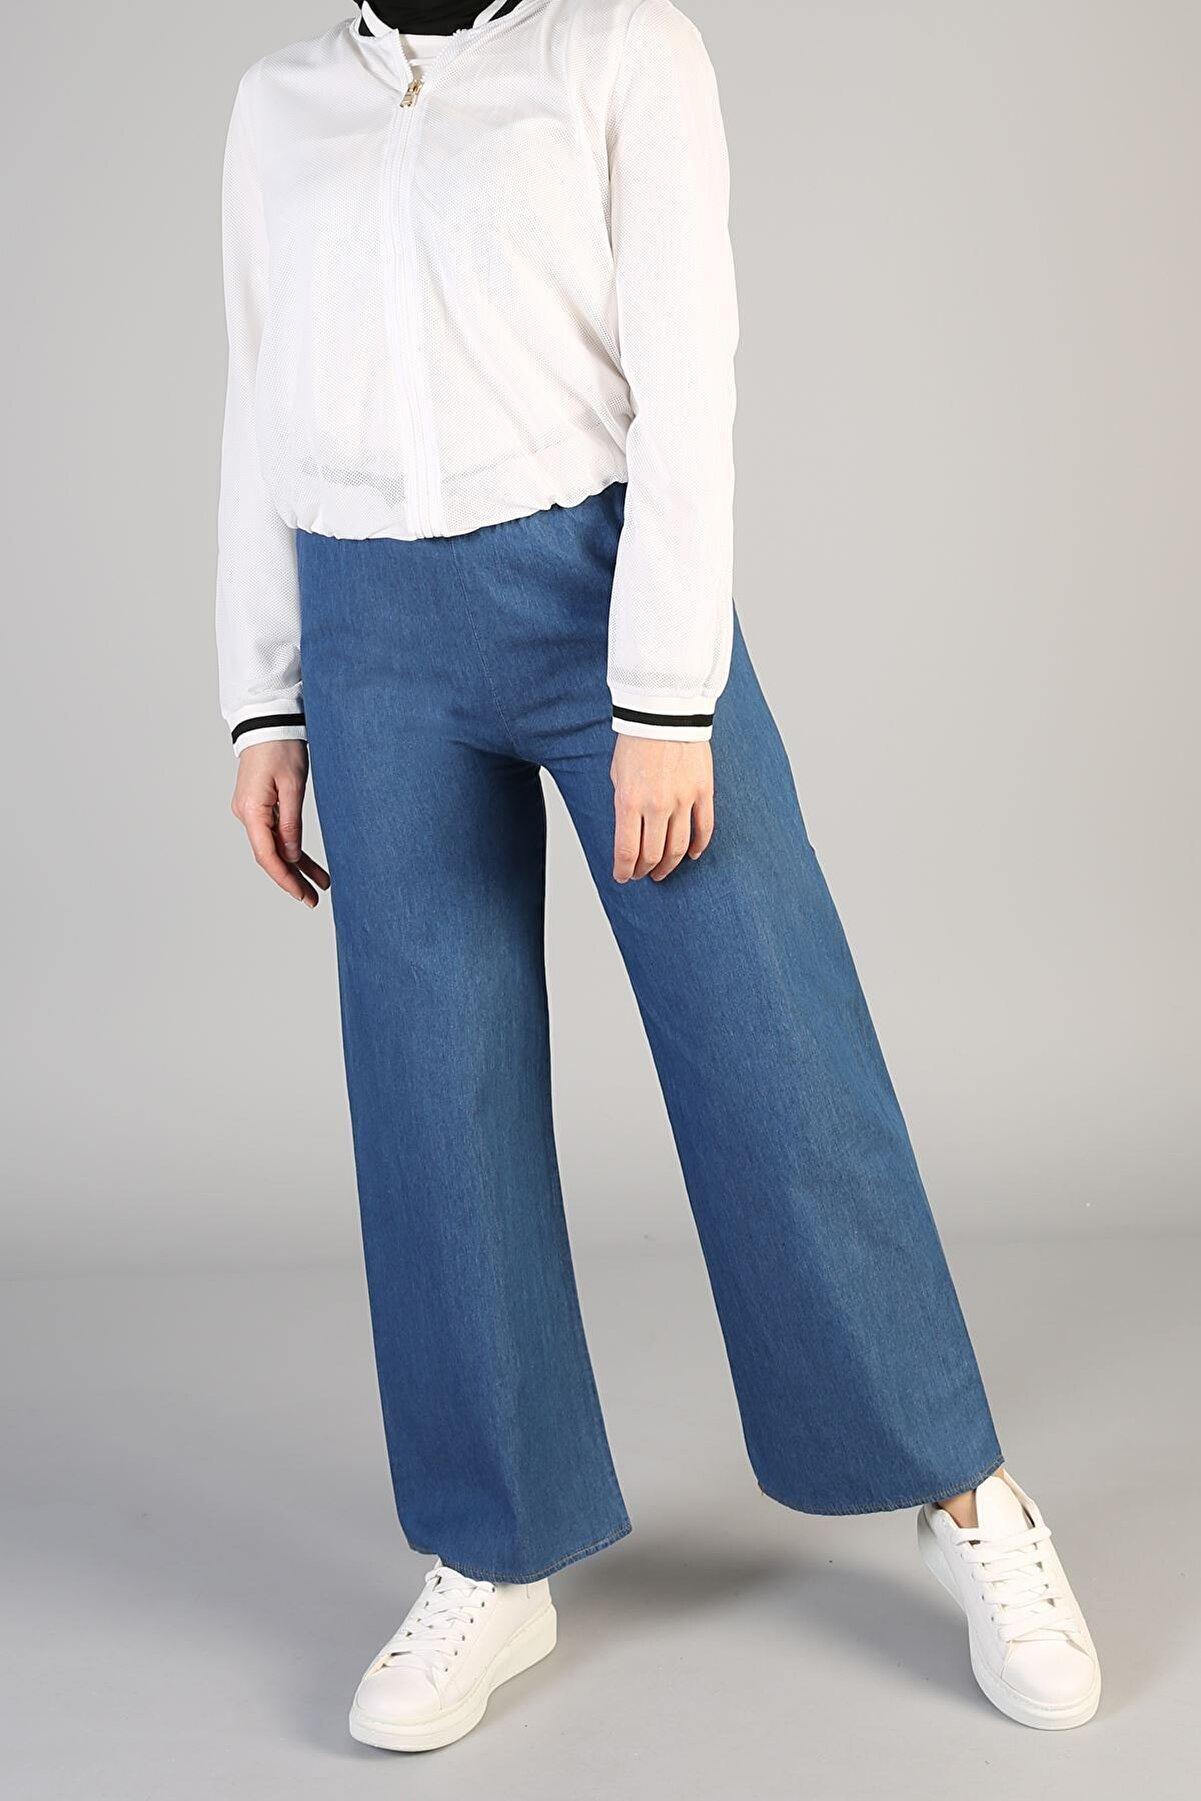 Naknaku Kadın Mavi Lastikli Bol Pantolon